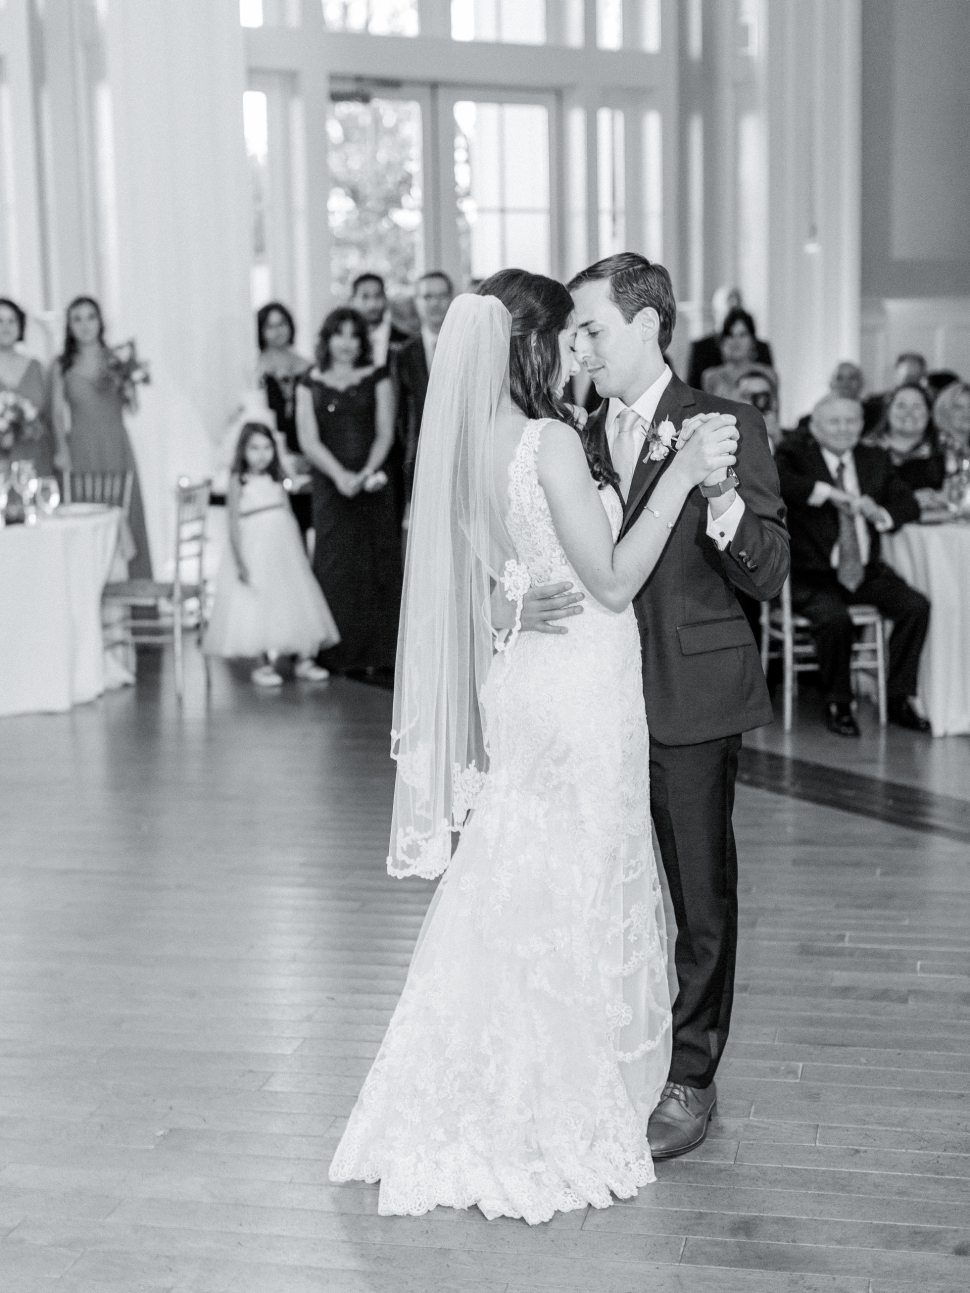 Ryland-Inn-Wedding-Photographer-Cassi-Claire_Ryland-Inn-Wedding_41.jpg